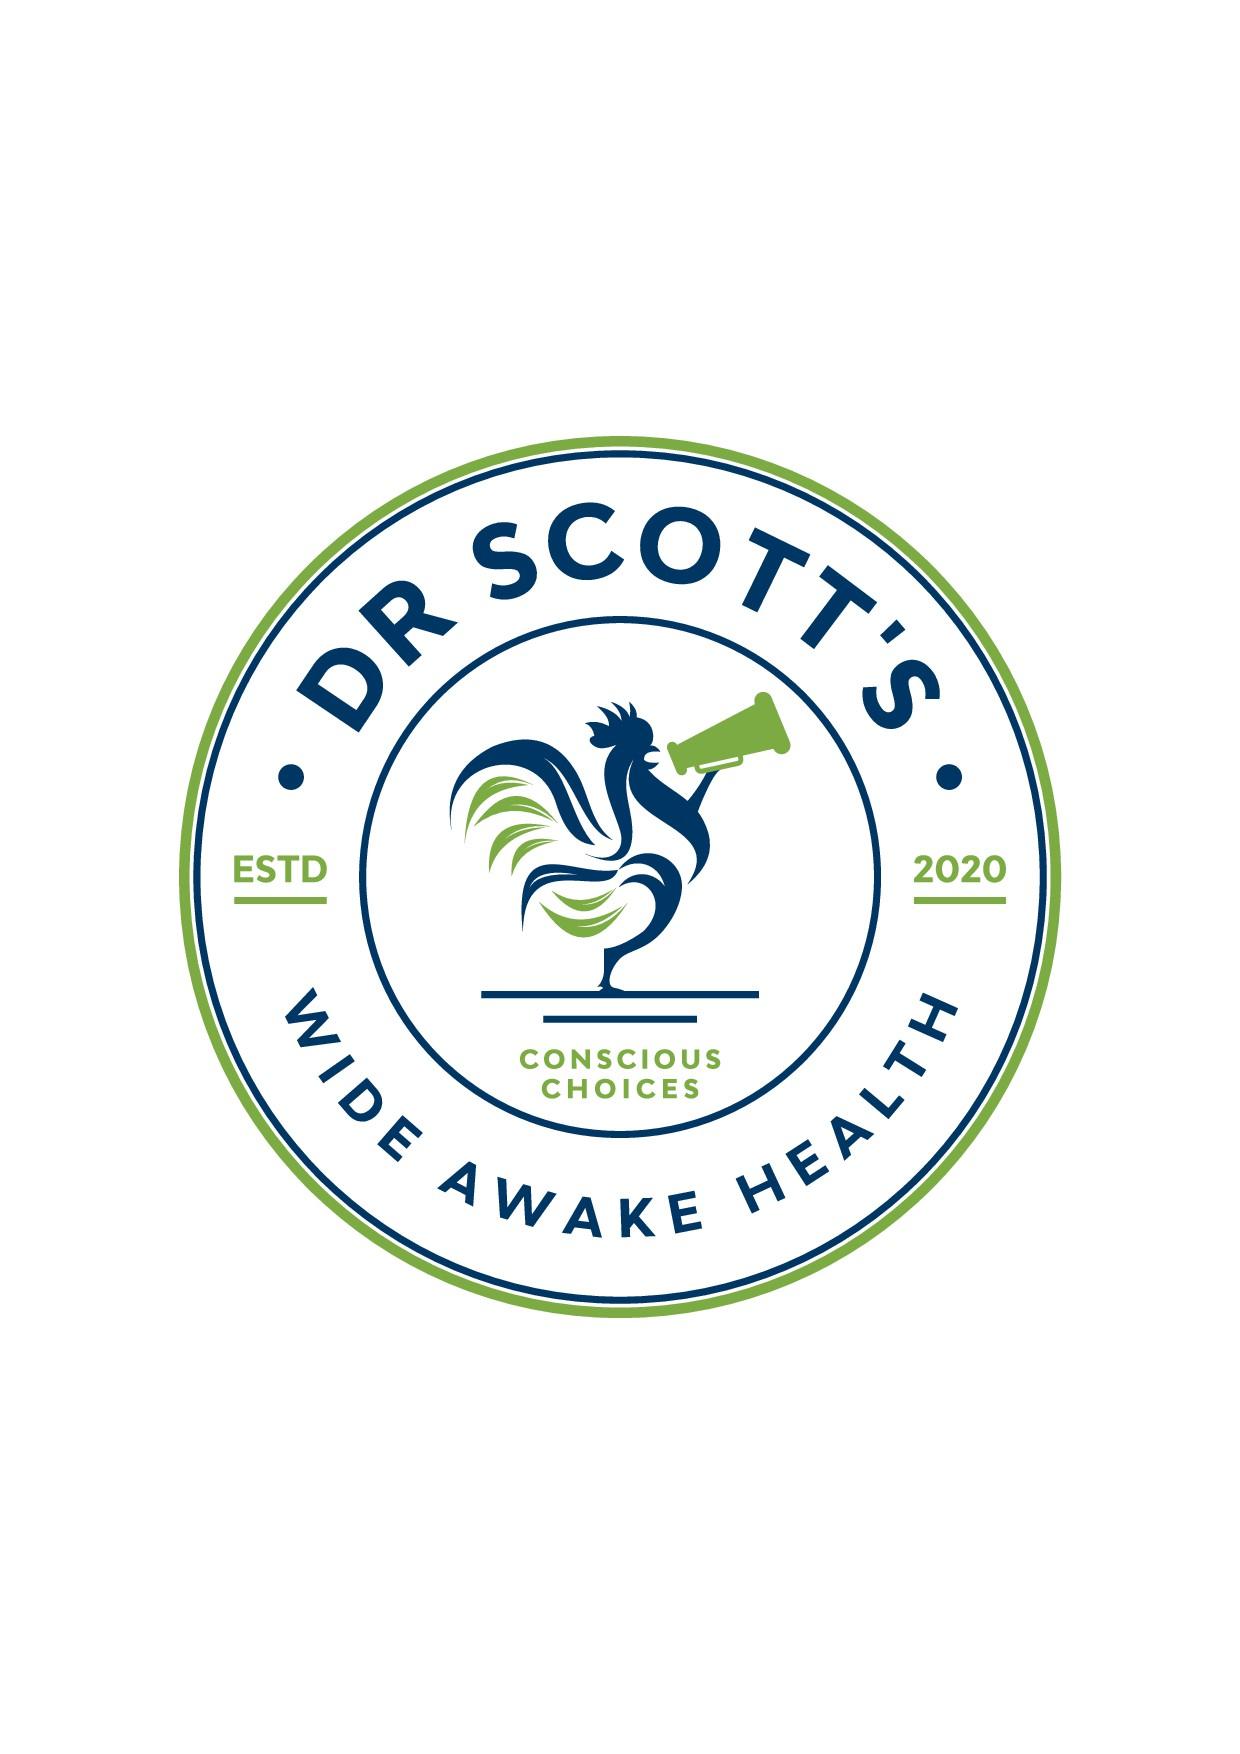 Dr Scott's Wide aAwake Health      logo